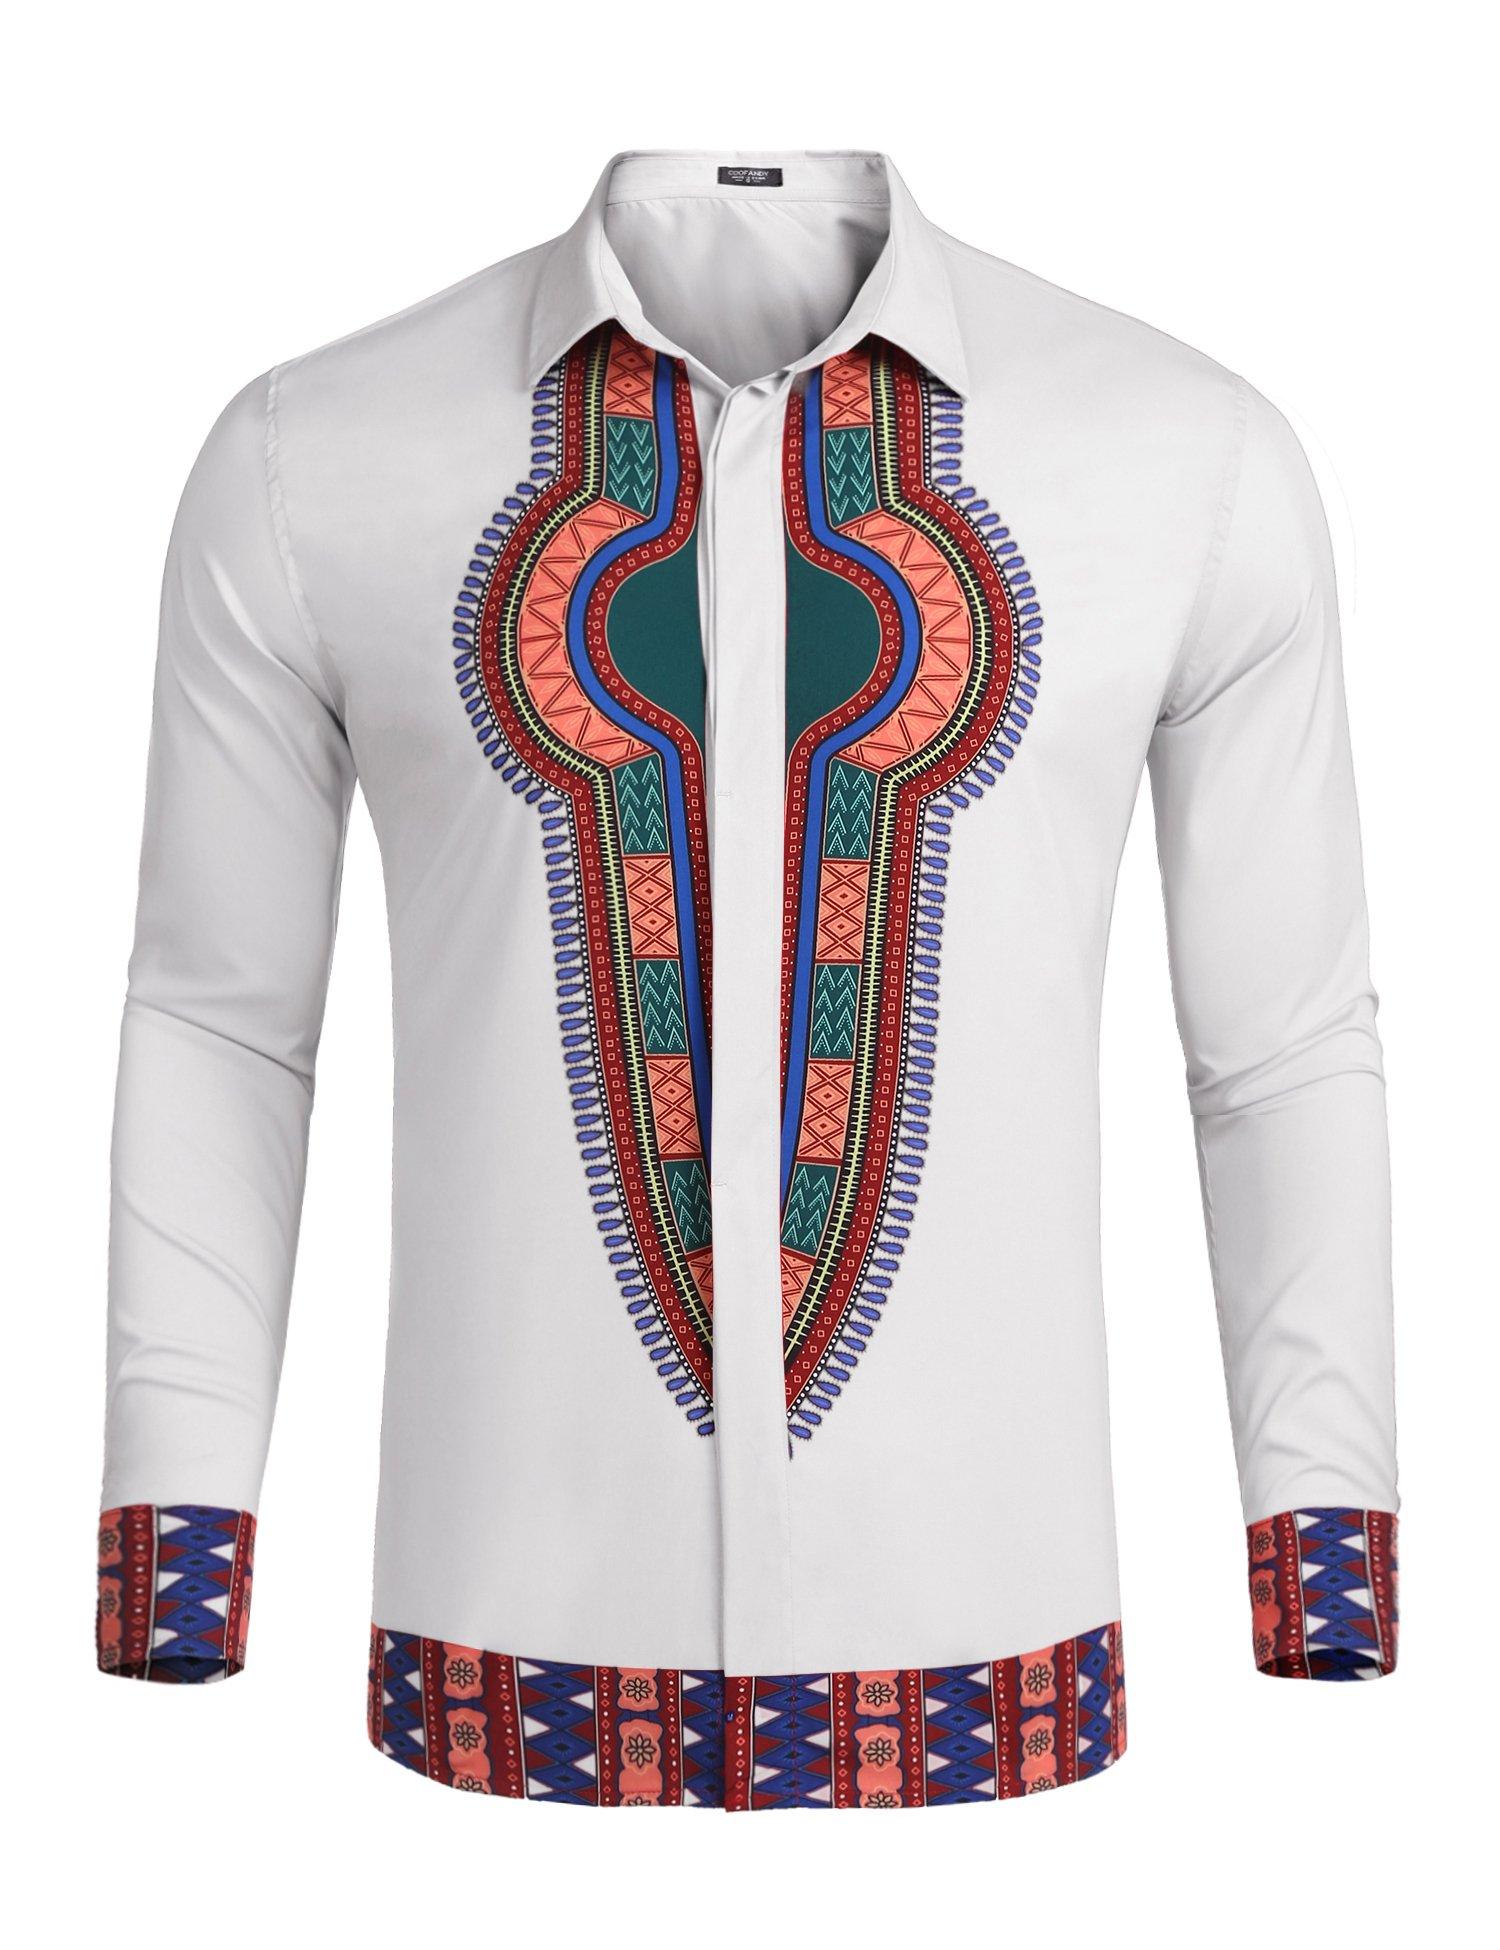 COOFANDY Mens Long Sleeves African Dashiki Button Down Shirt, White, Medium